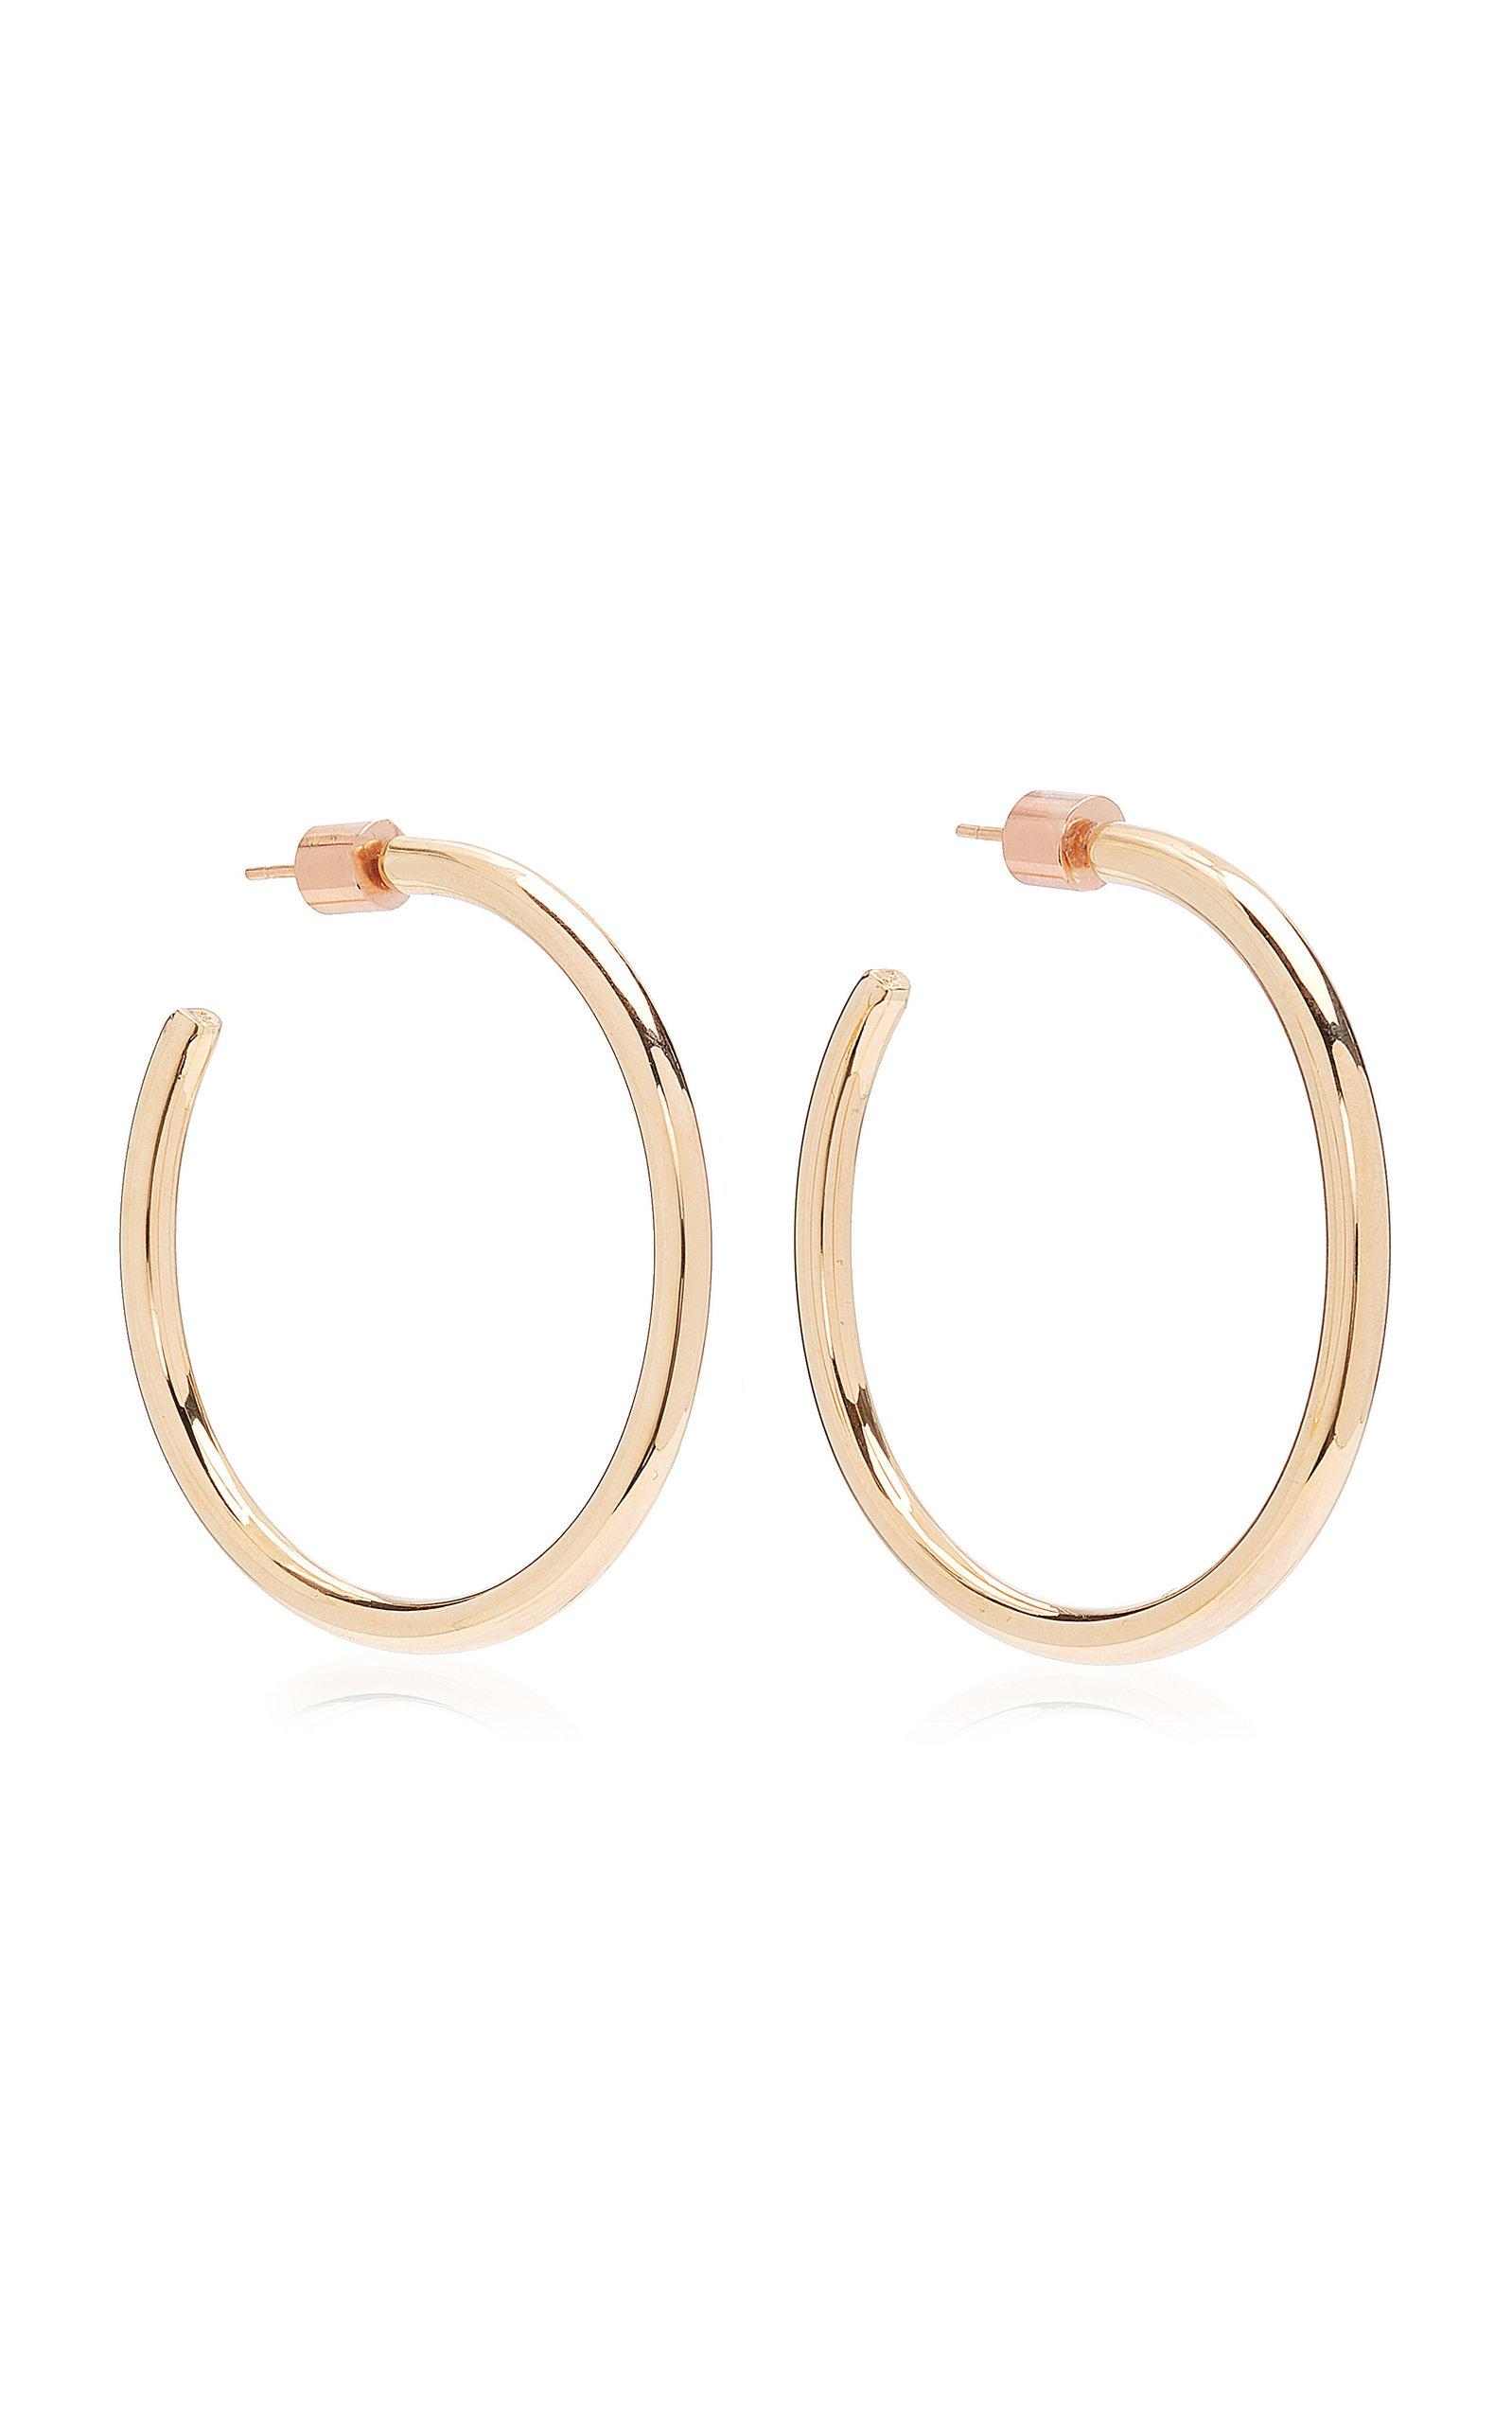 Women's Baby Classic 14K Rose Gold-Plated Hoop Earrings